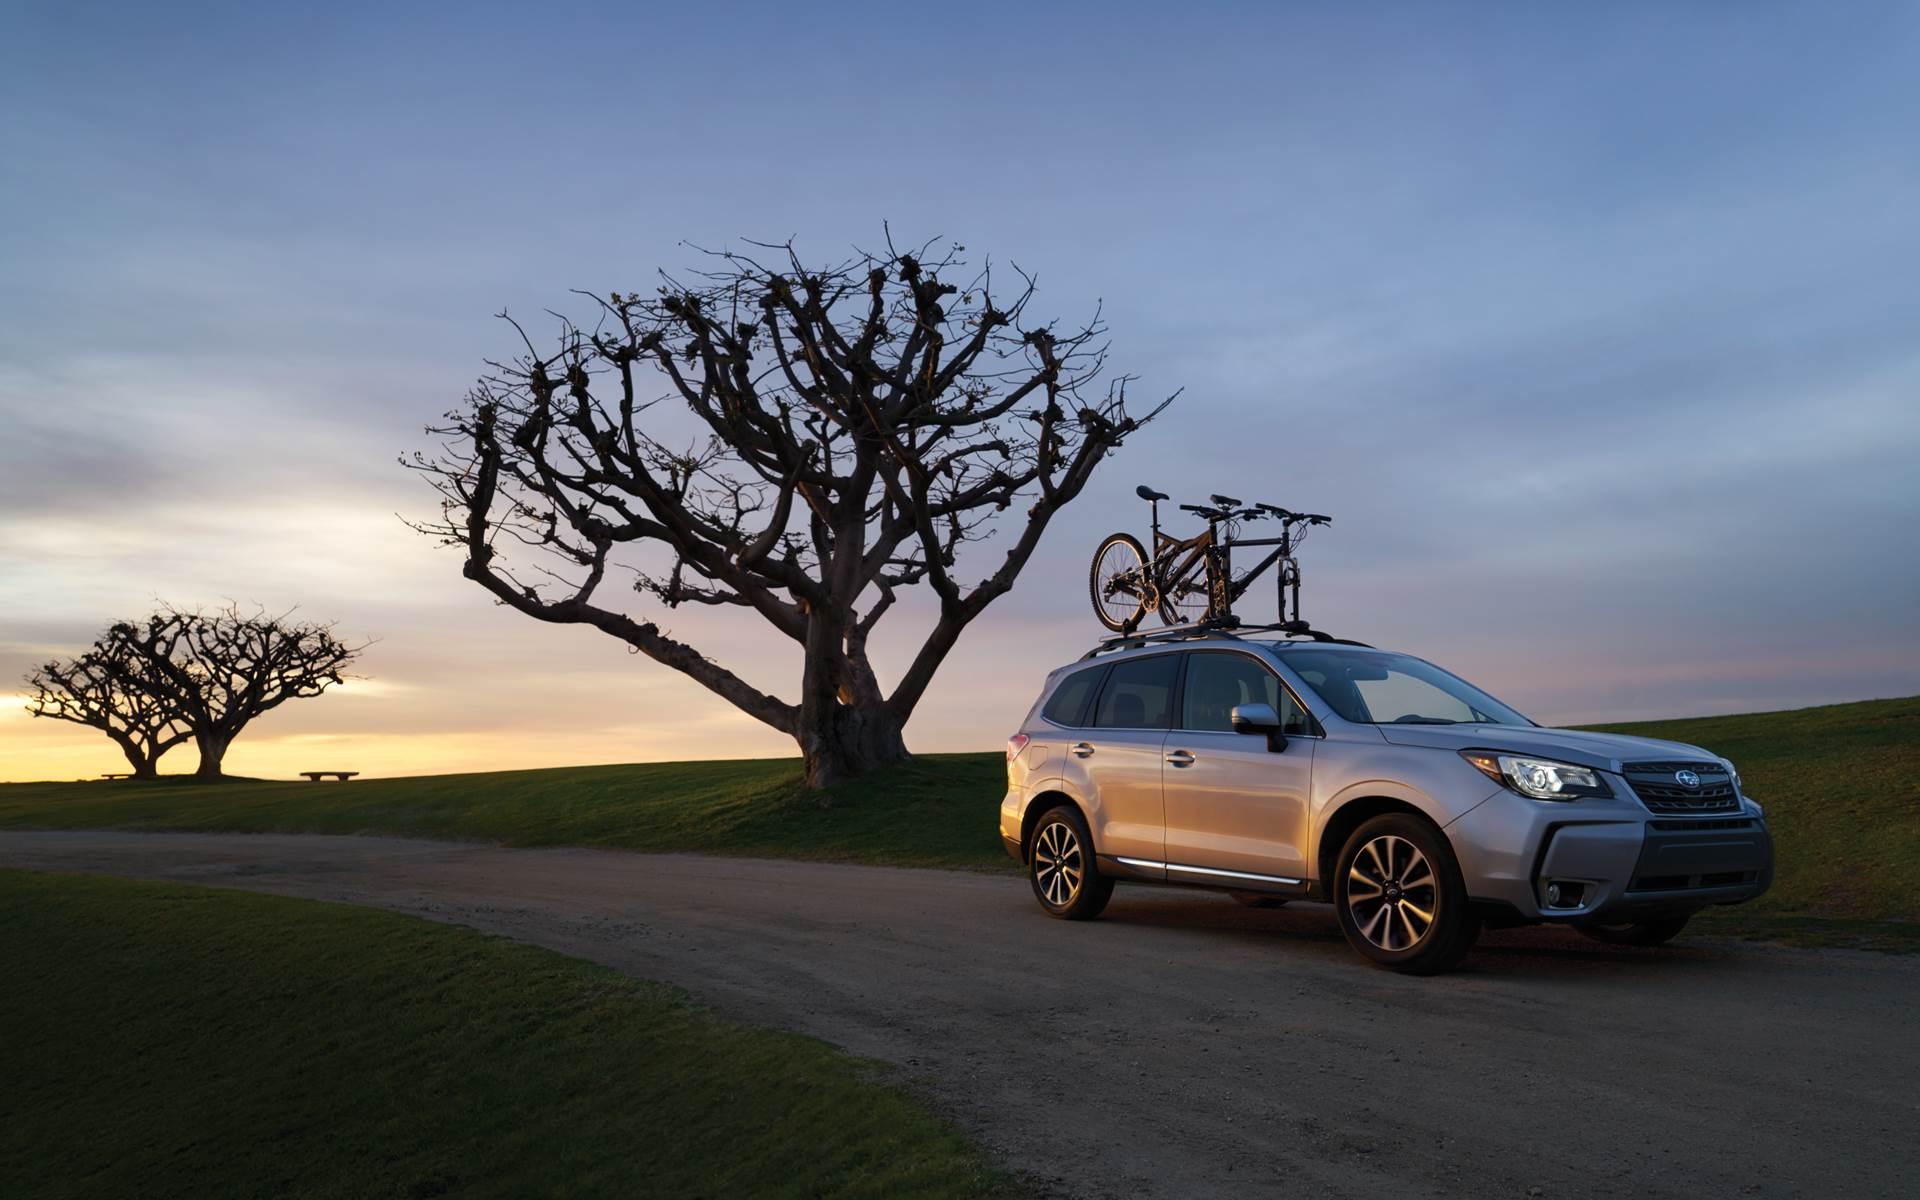 New Subaru Forester Lease and Finance Offers Auburn WA